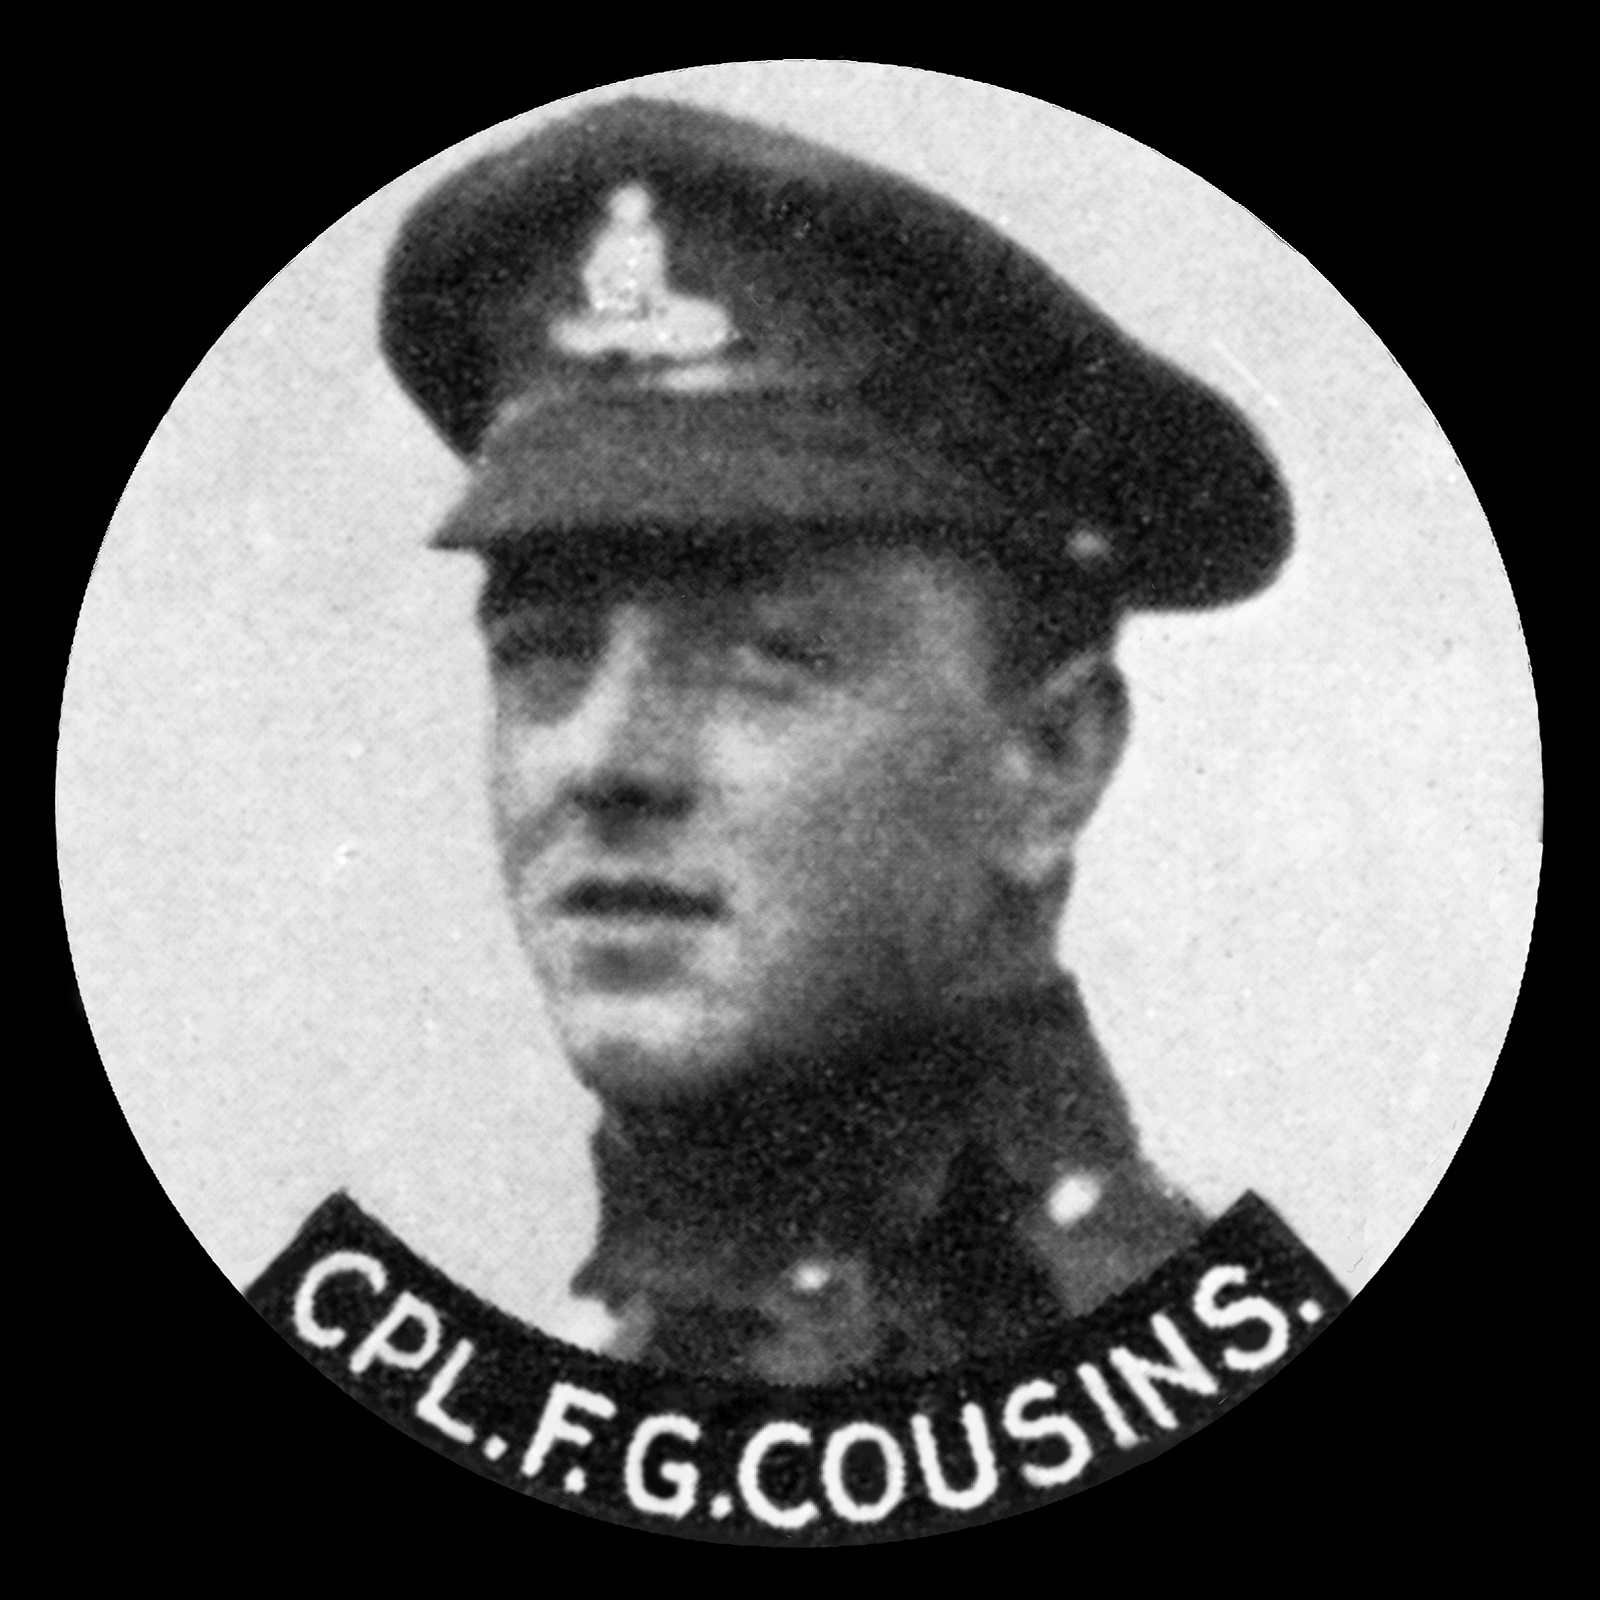 COUSINS Francis Goss